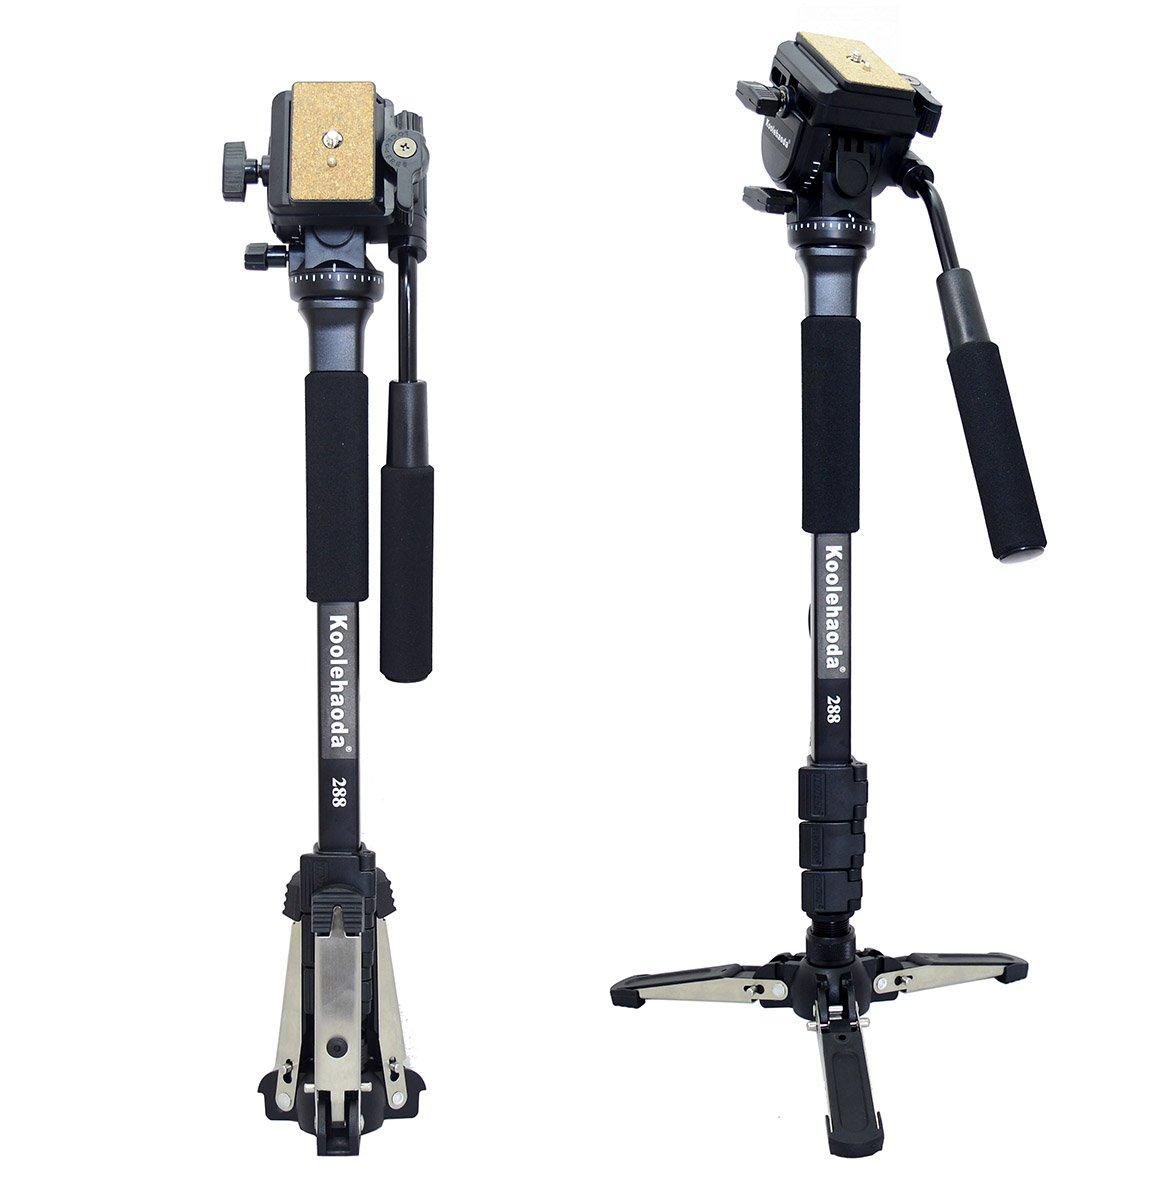 Koolehaoda Professional Camera Aluminium Monopod Fluid Video Head with Folding Three Feet Support Stand, Max:58.2''(OEM Yunteng288 Monopod)